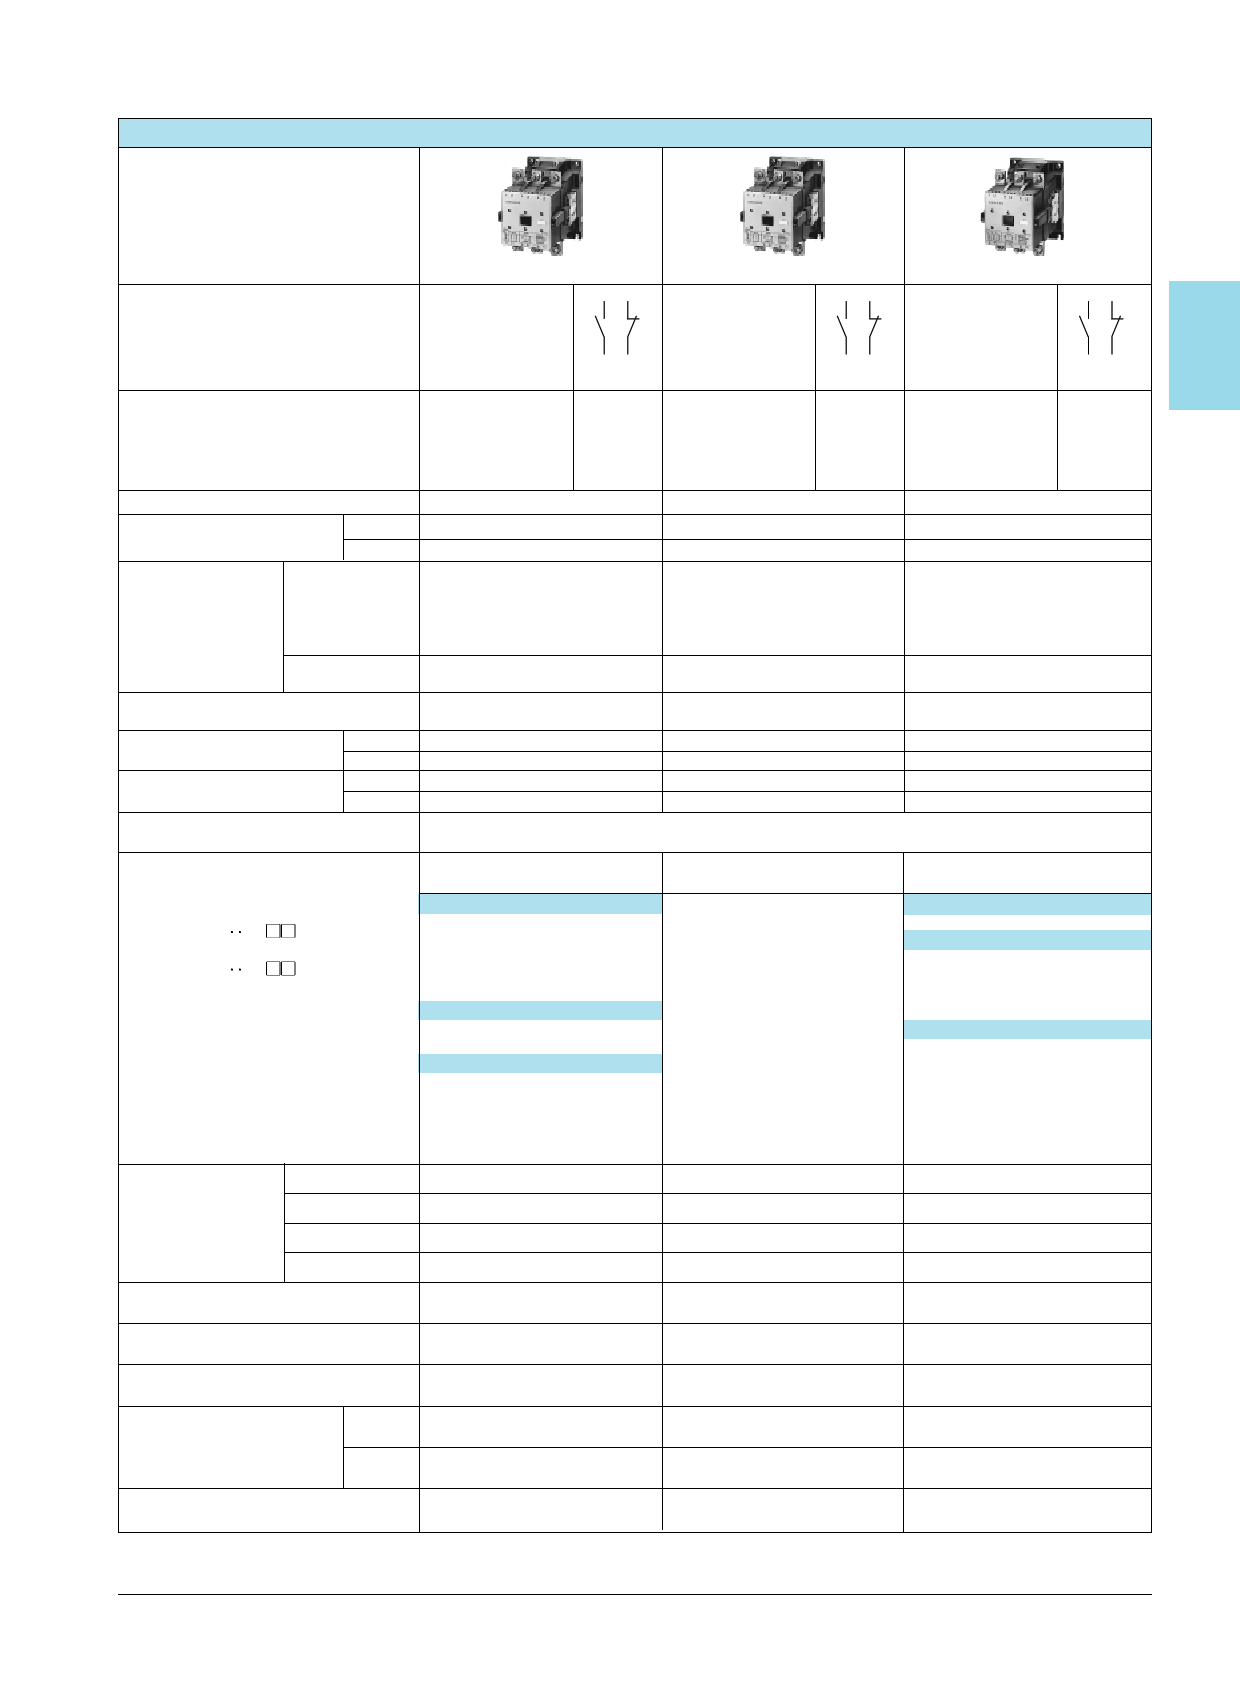 3TF45 Datasheet, Funktion